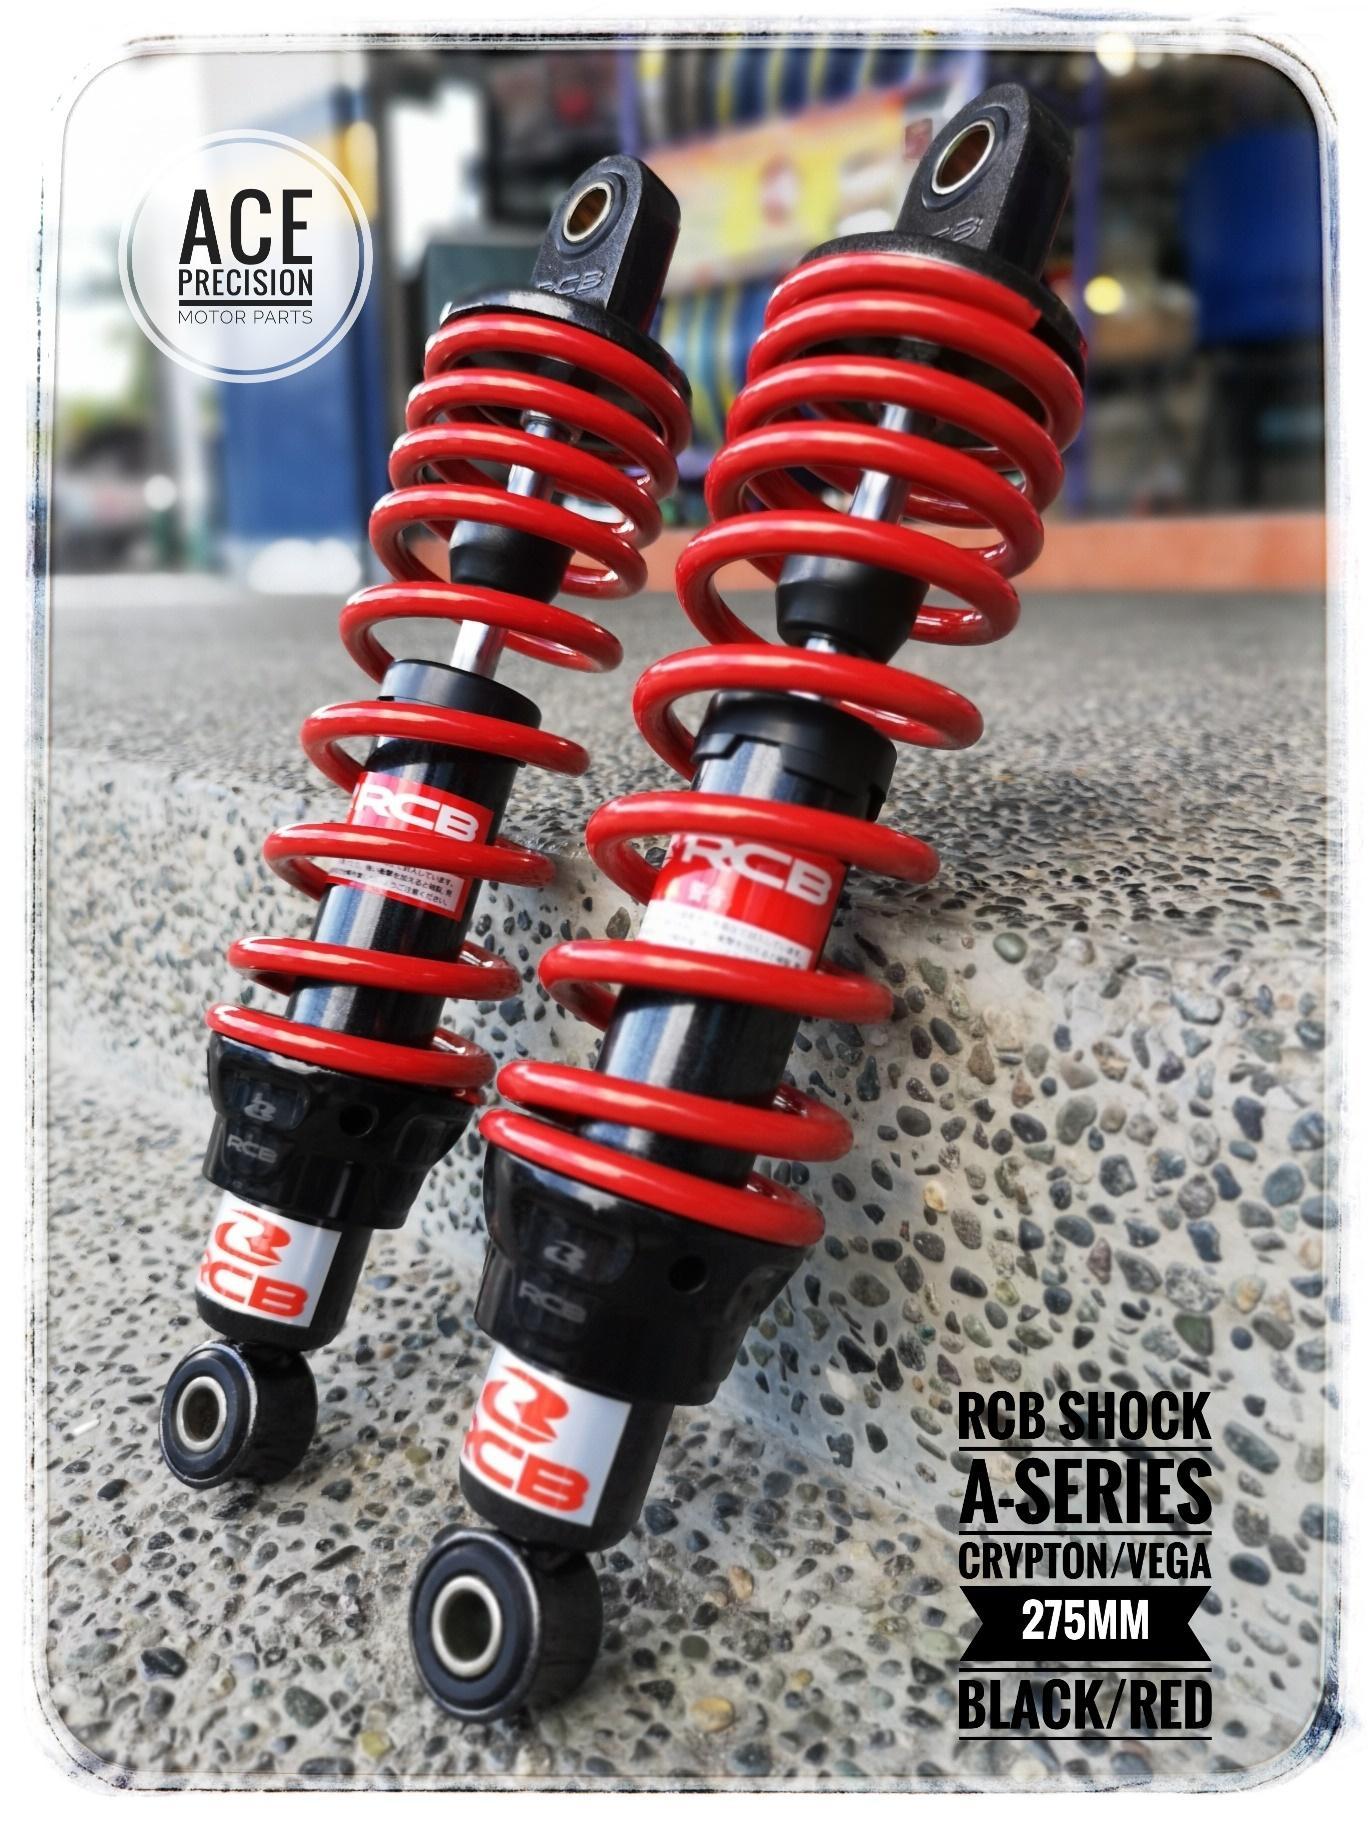 RACING BOY Dual Shock Absorber A-Series 275mm [BLACK] RED